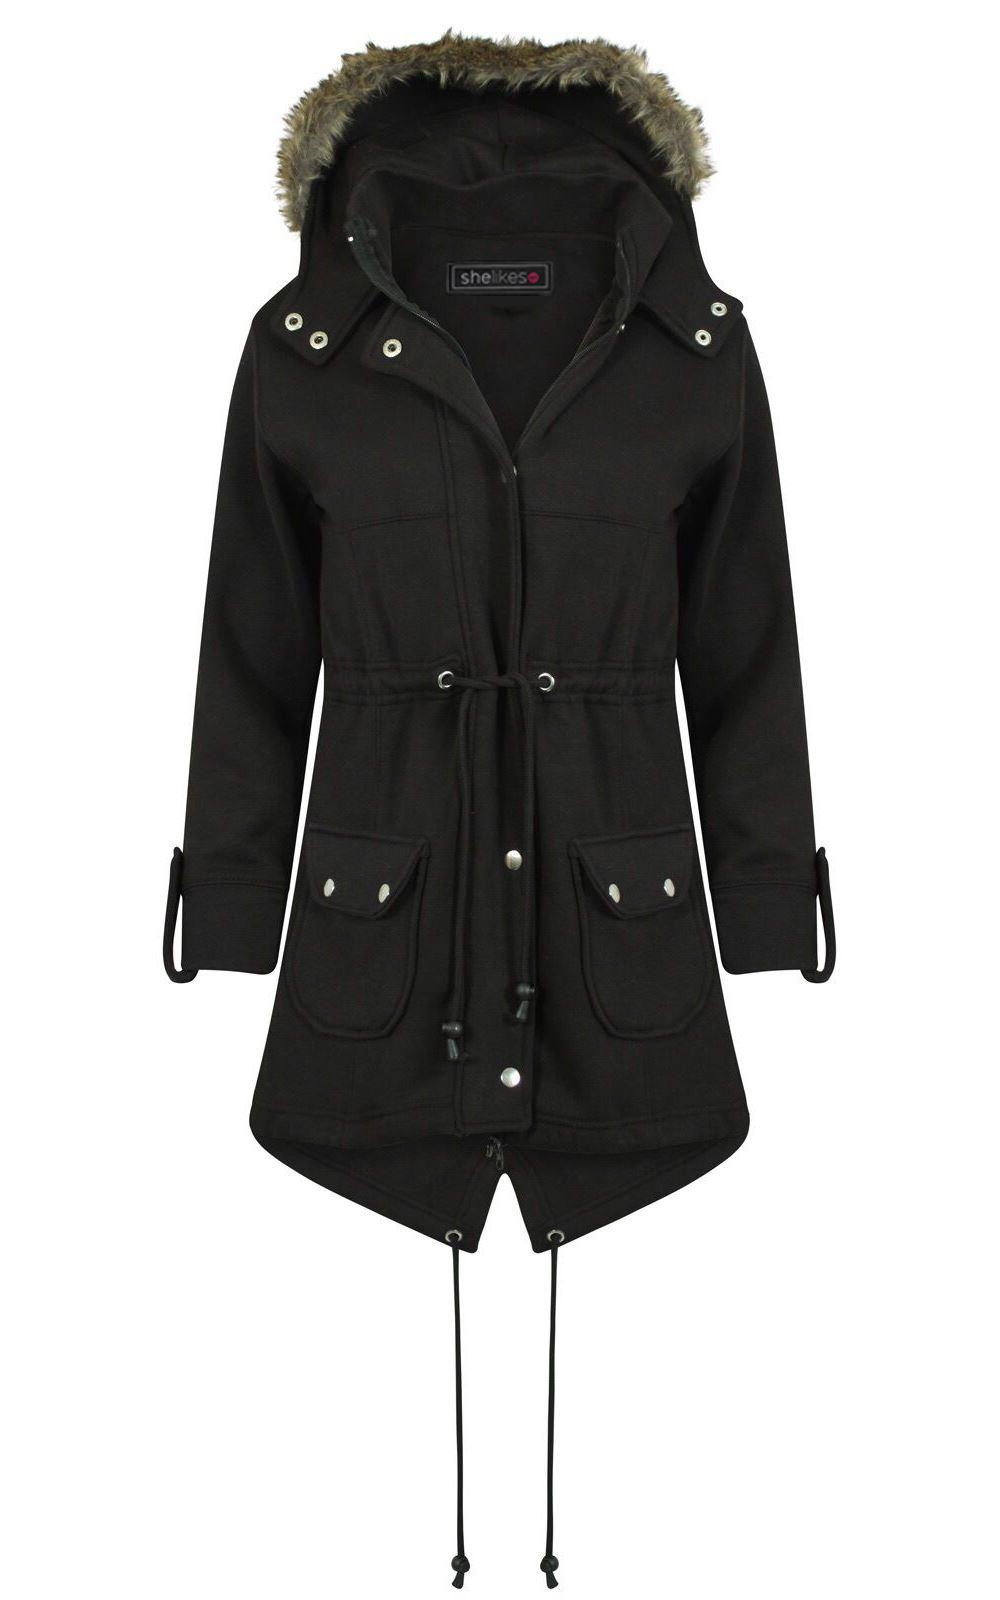 Womens faux fur hooded coat